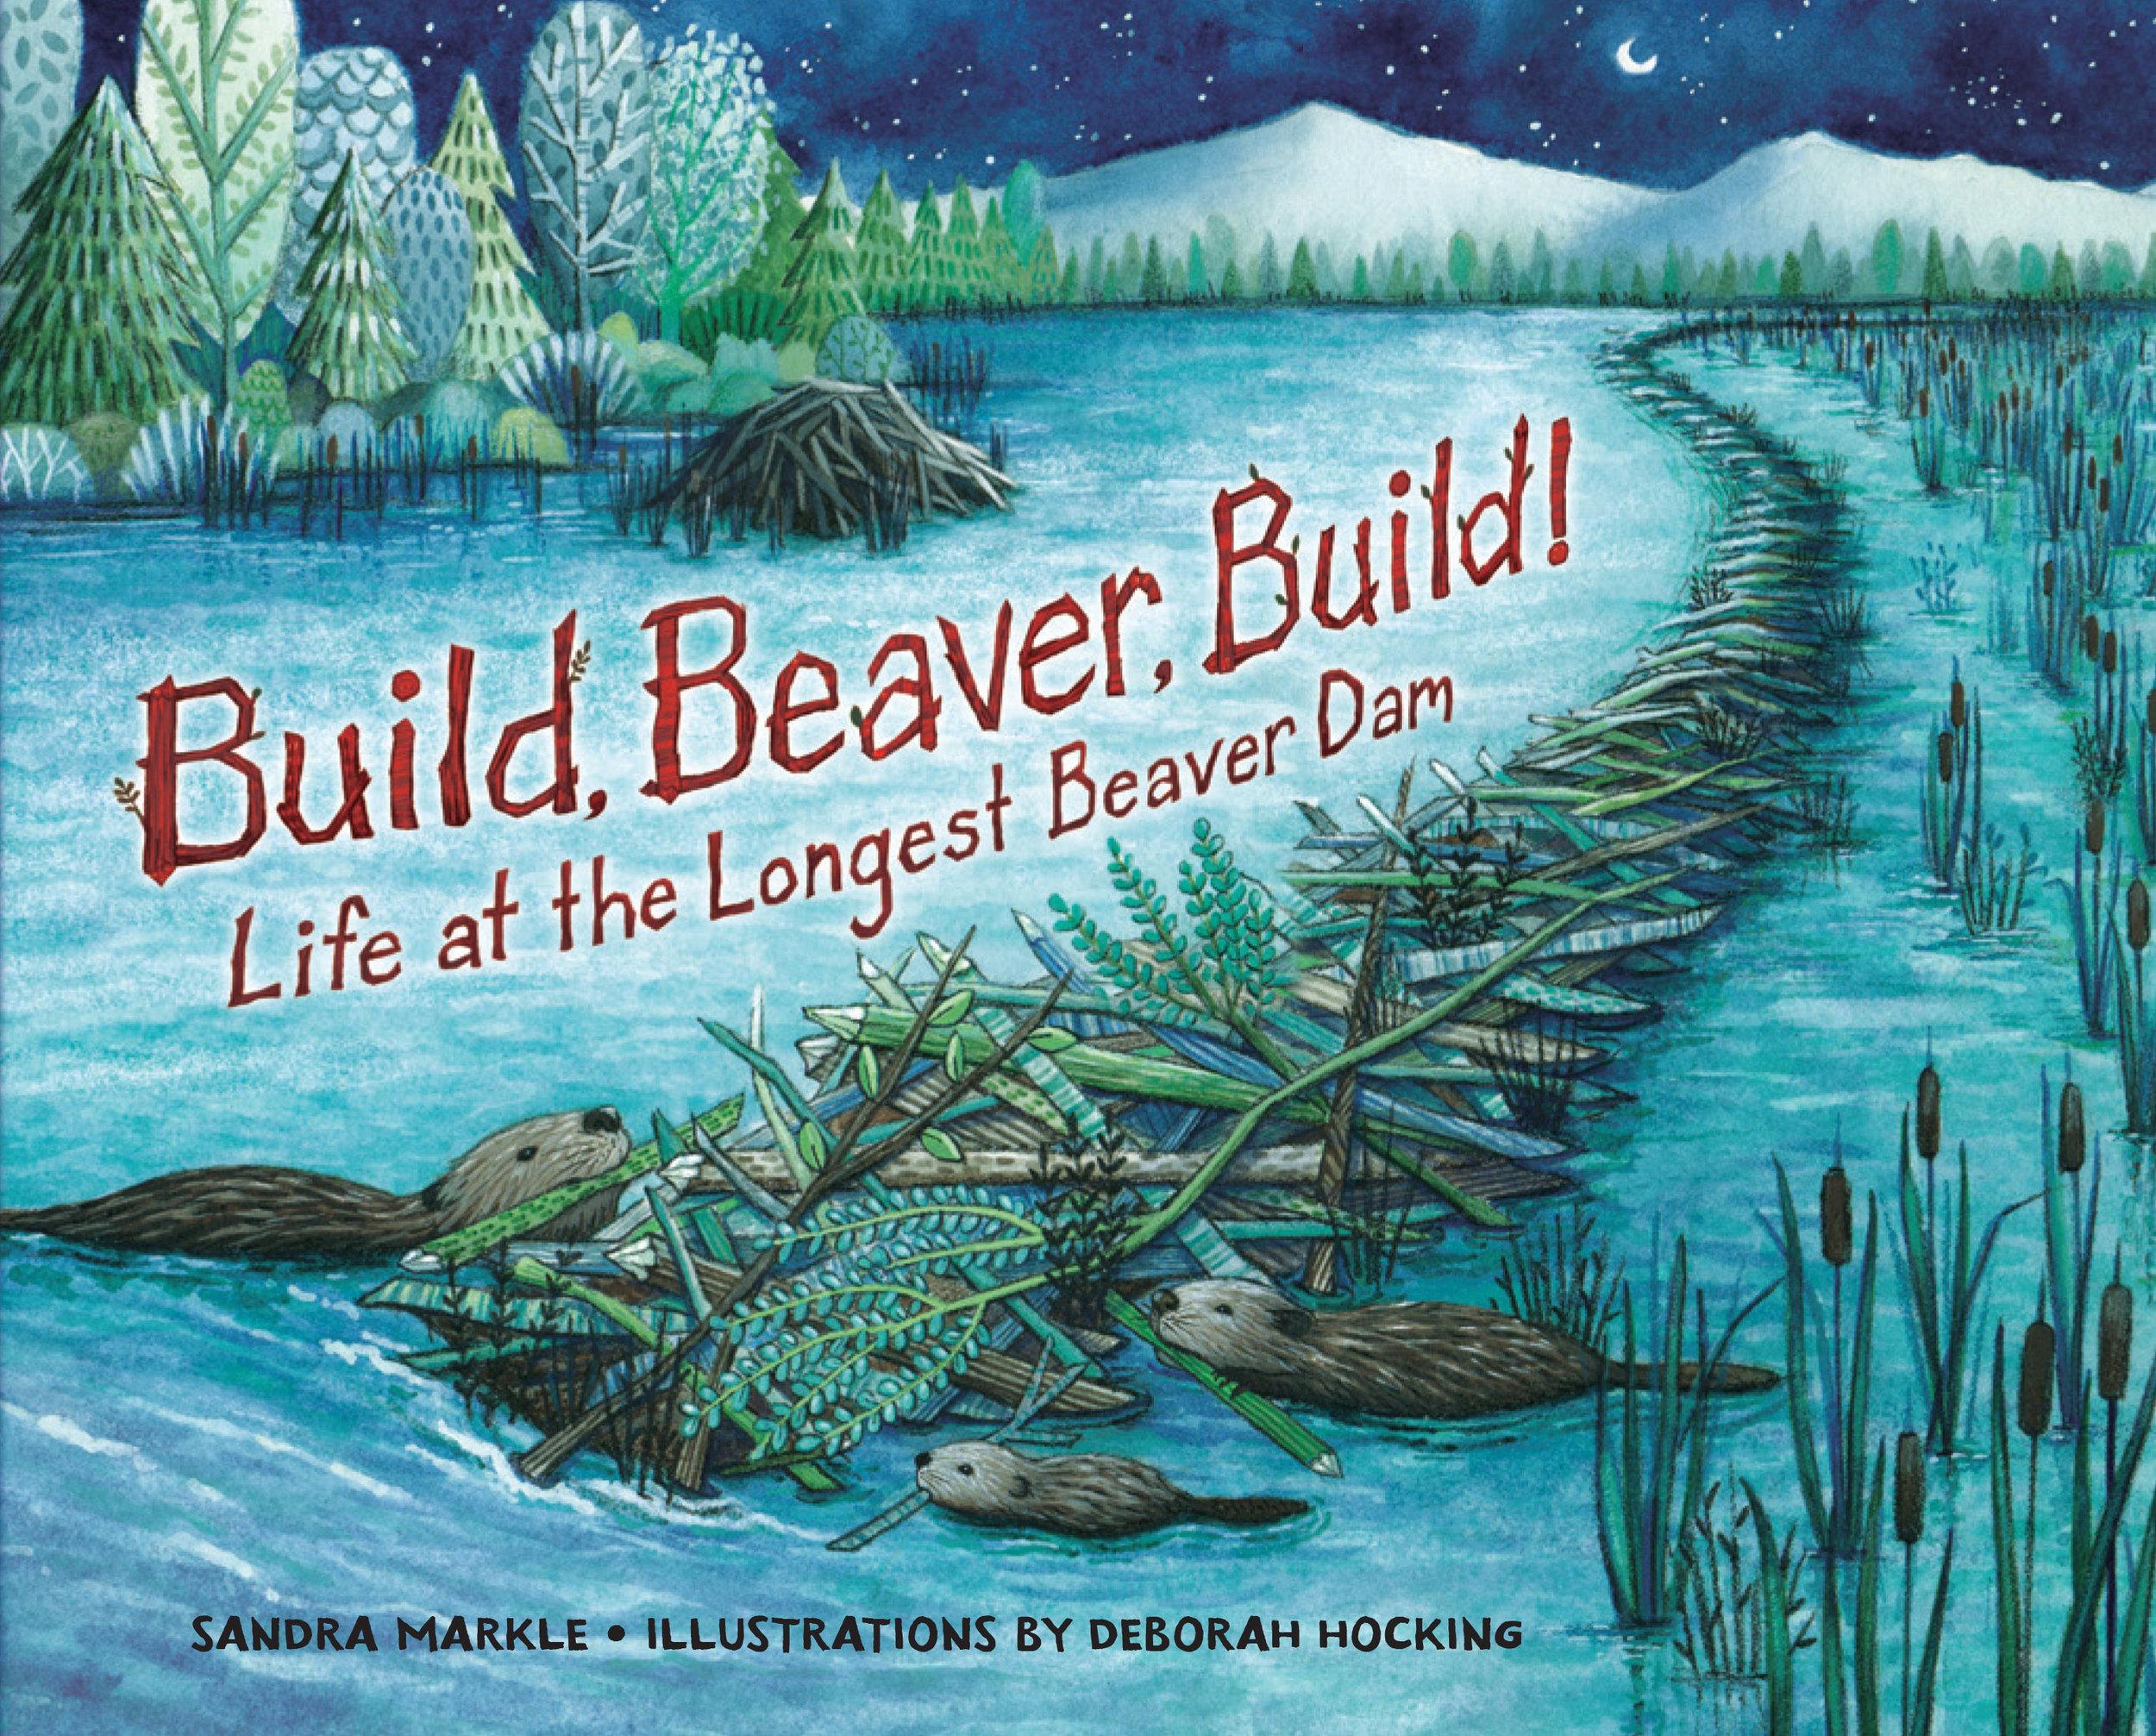 Hocking, Deborah 2016_03 - BUILD BEAVER BUILD LIFE AT THE LONGEST BEAVER DAM - NF PB - RLM LK.jpg